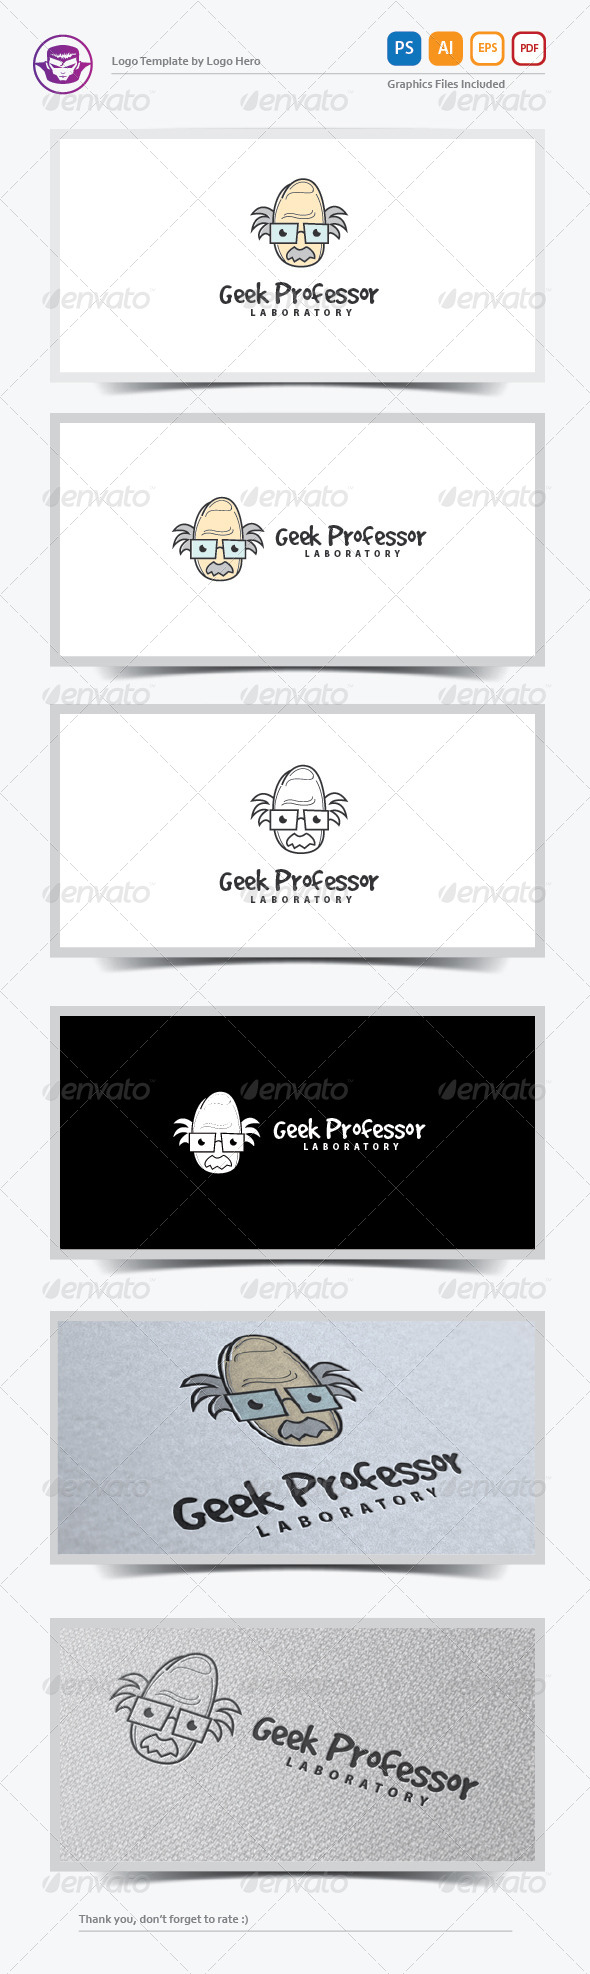 GraphicRiver Geek Professor Logo Template 7926760